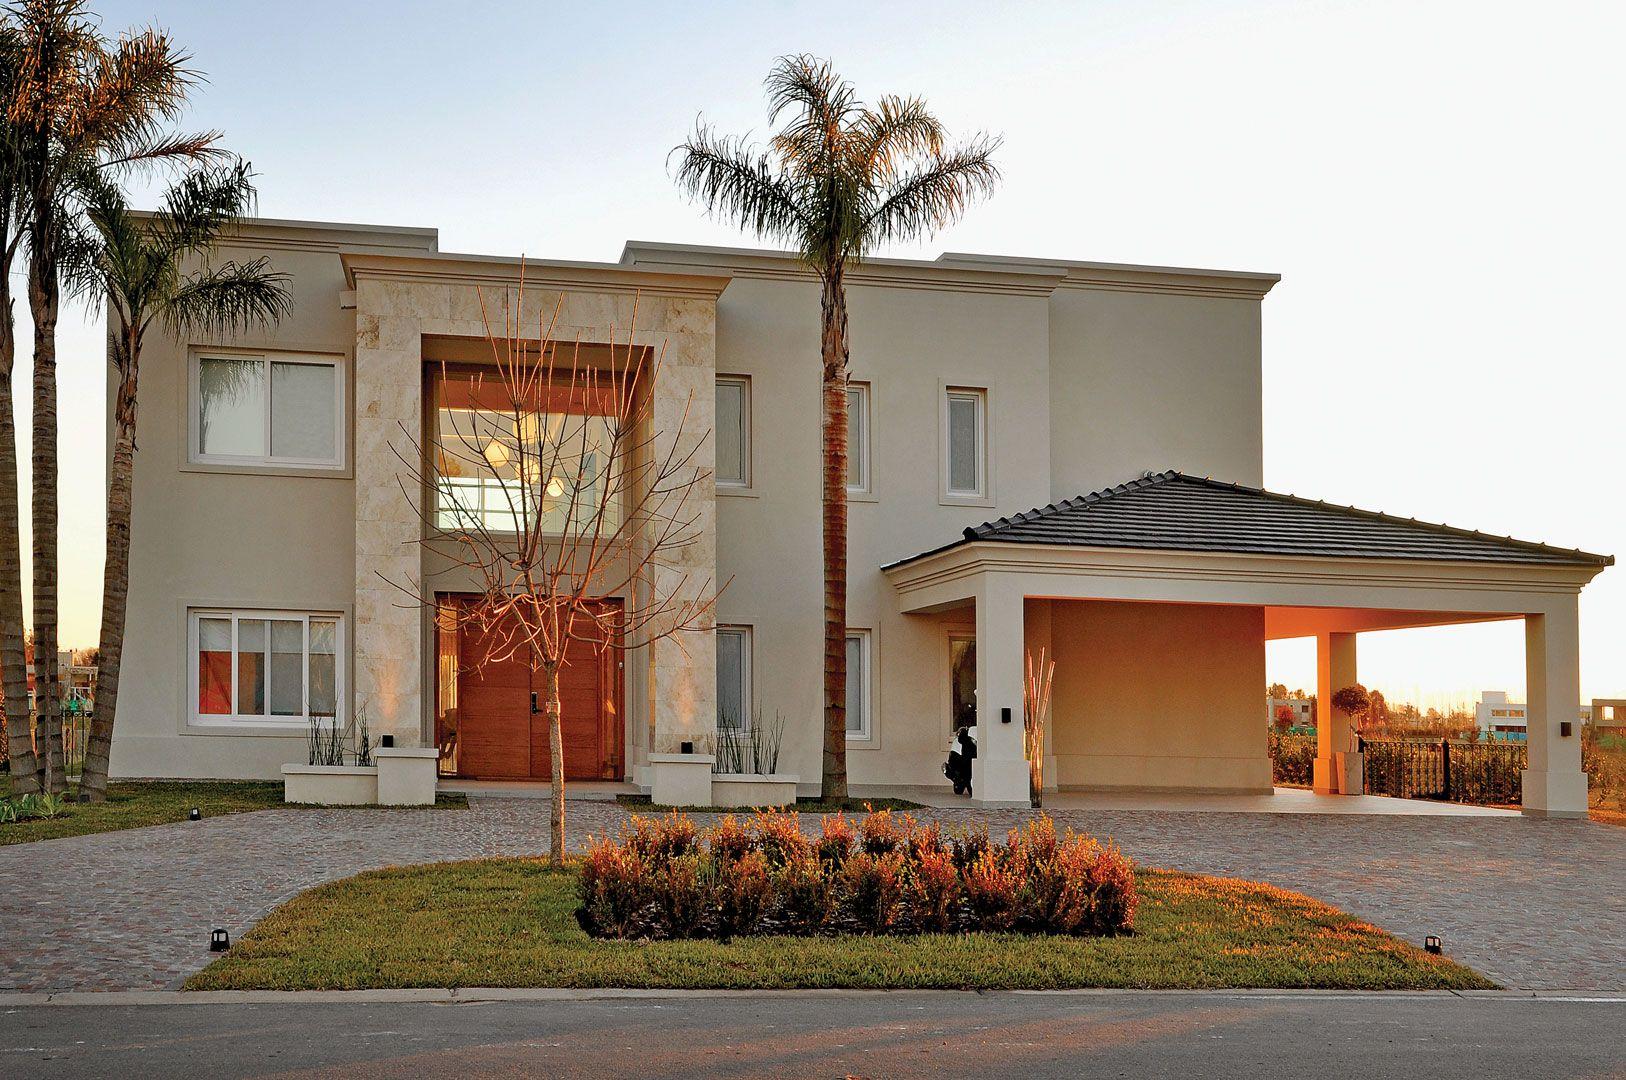 Arquitecto daniel tarrio y asociados casas clasicas classic houses - Casa rural daniel ...